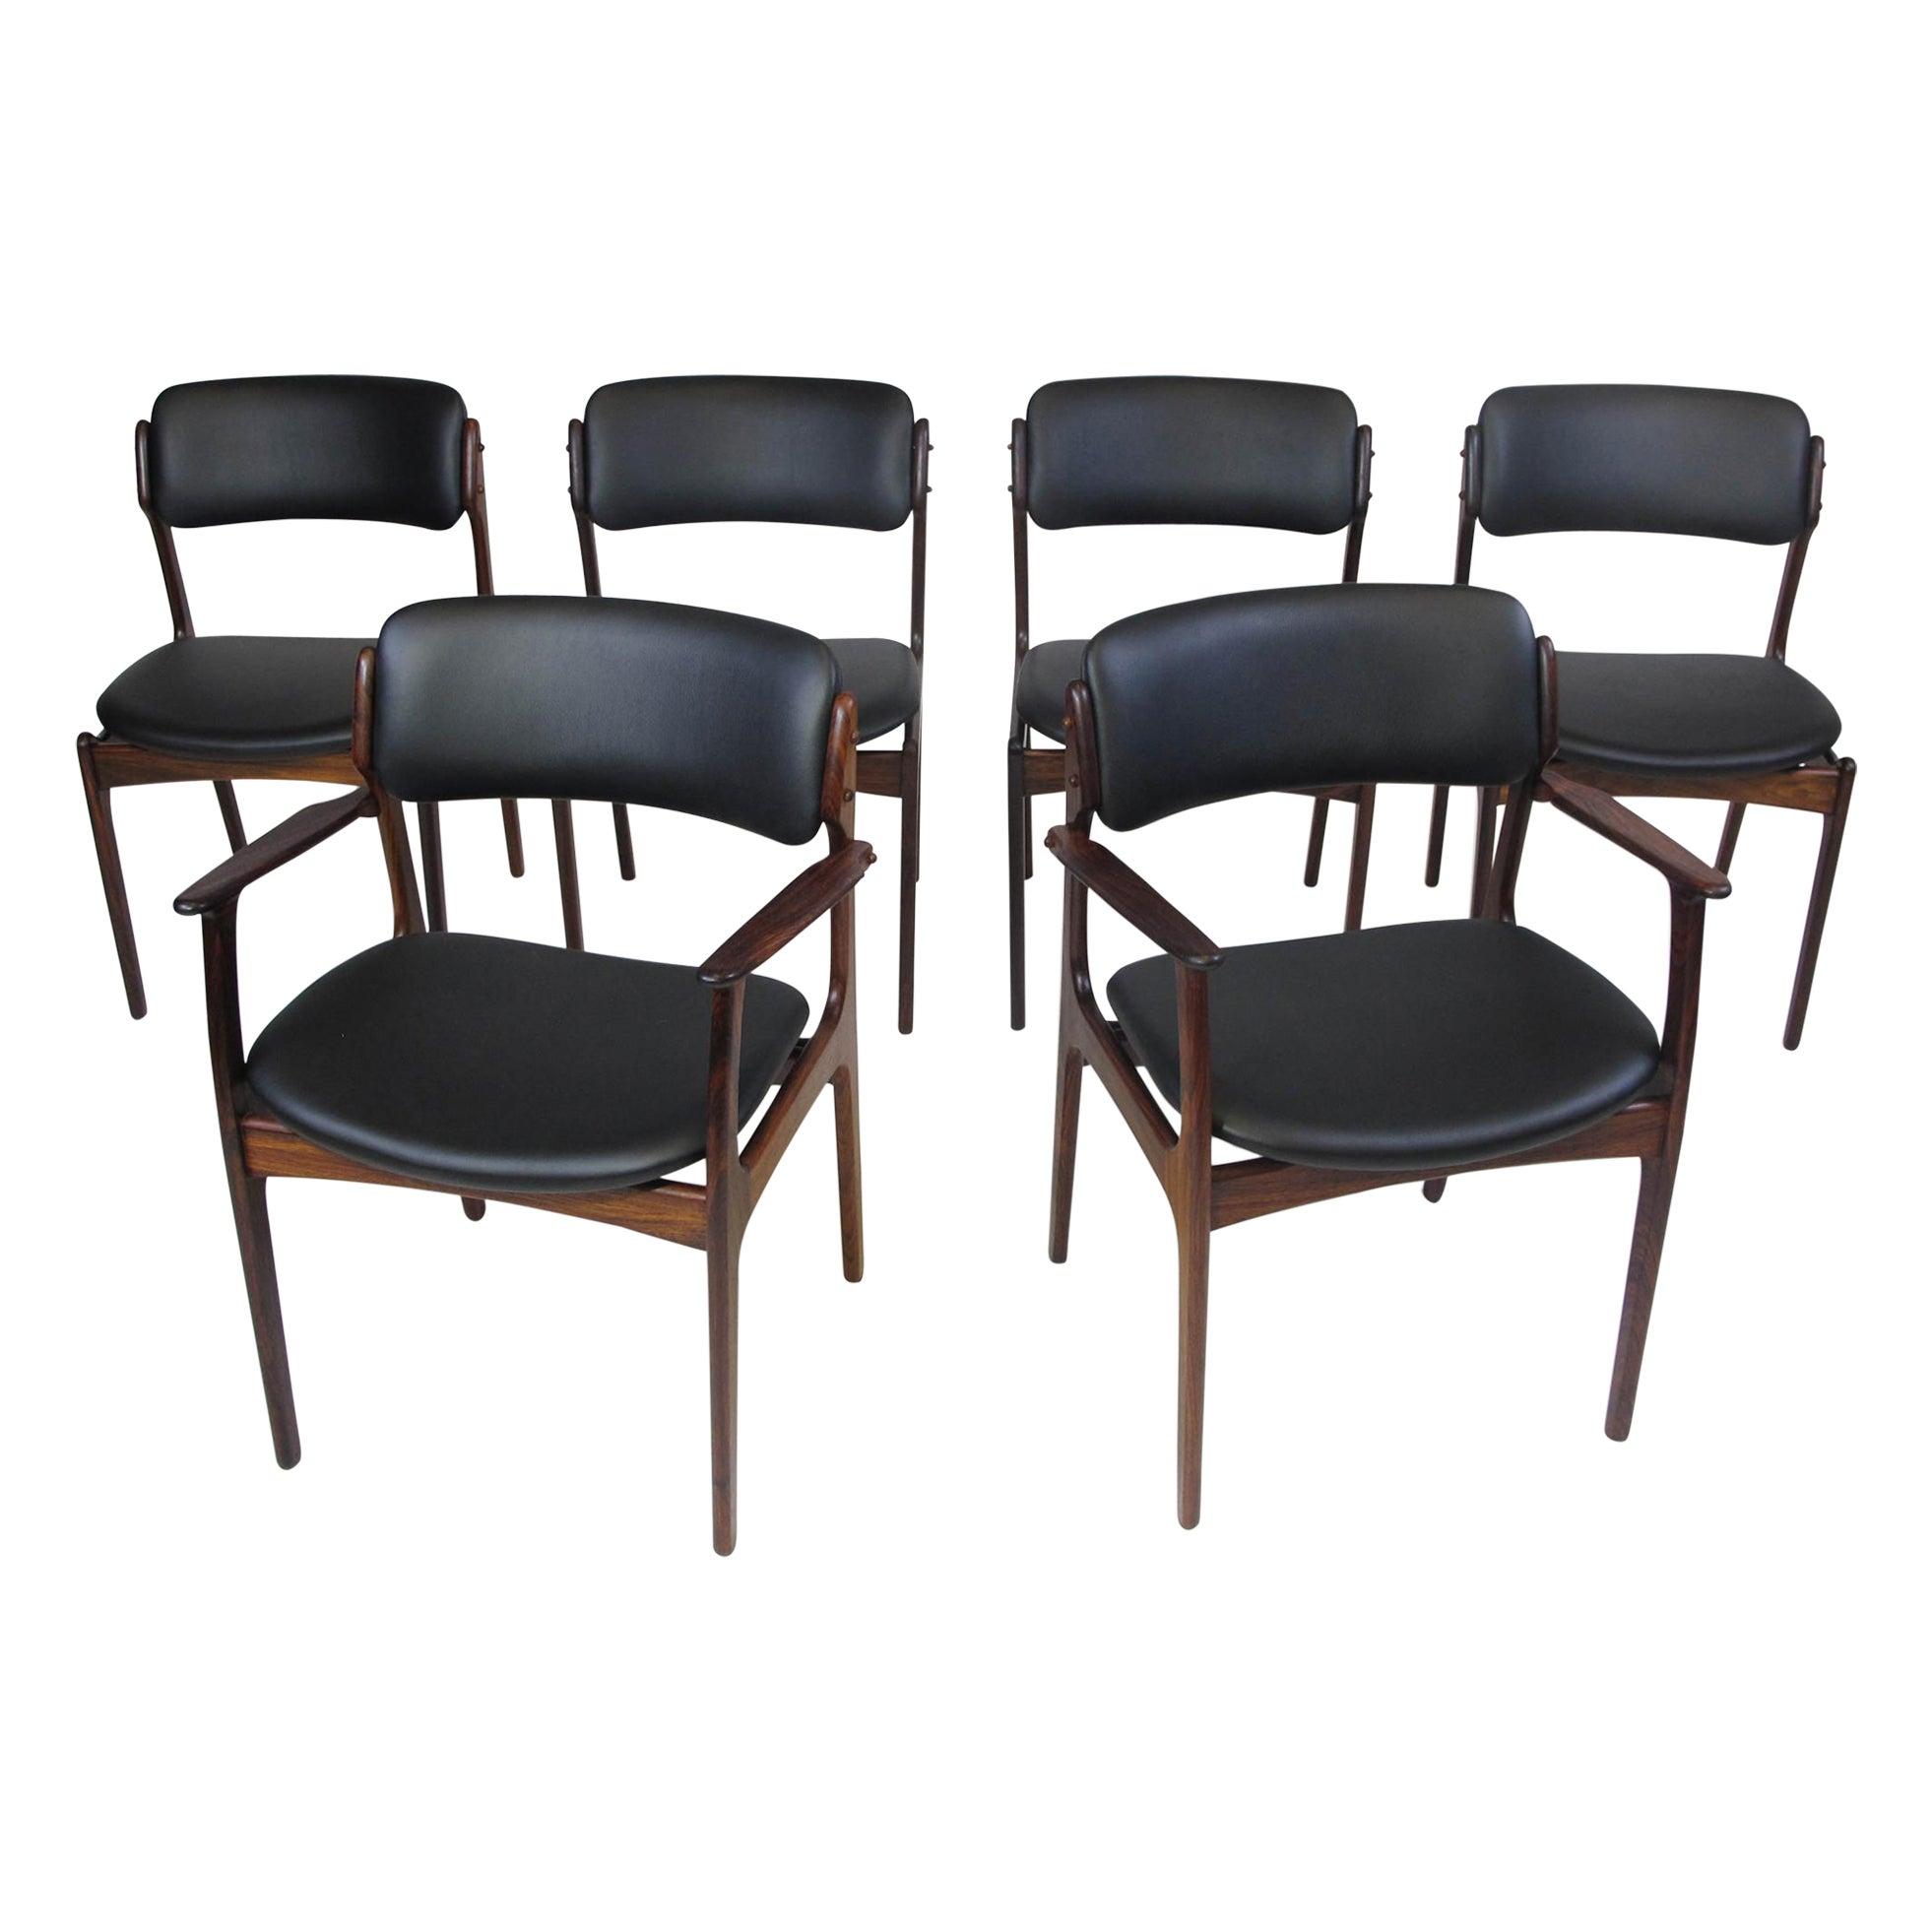 6 Erik Buck Rosewood Danish Dining Chairs in Black Leather